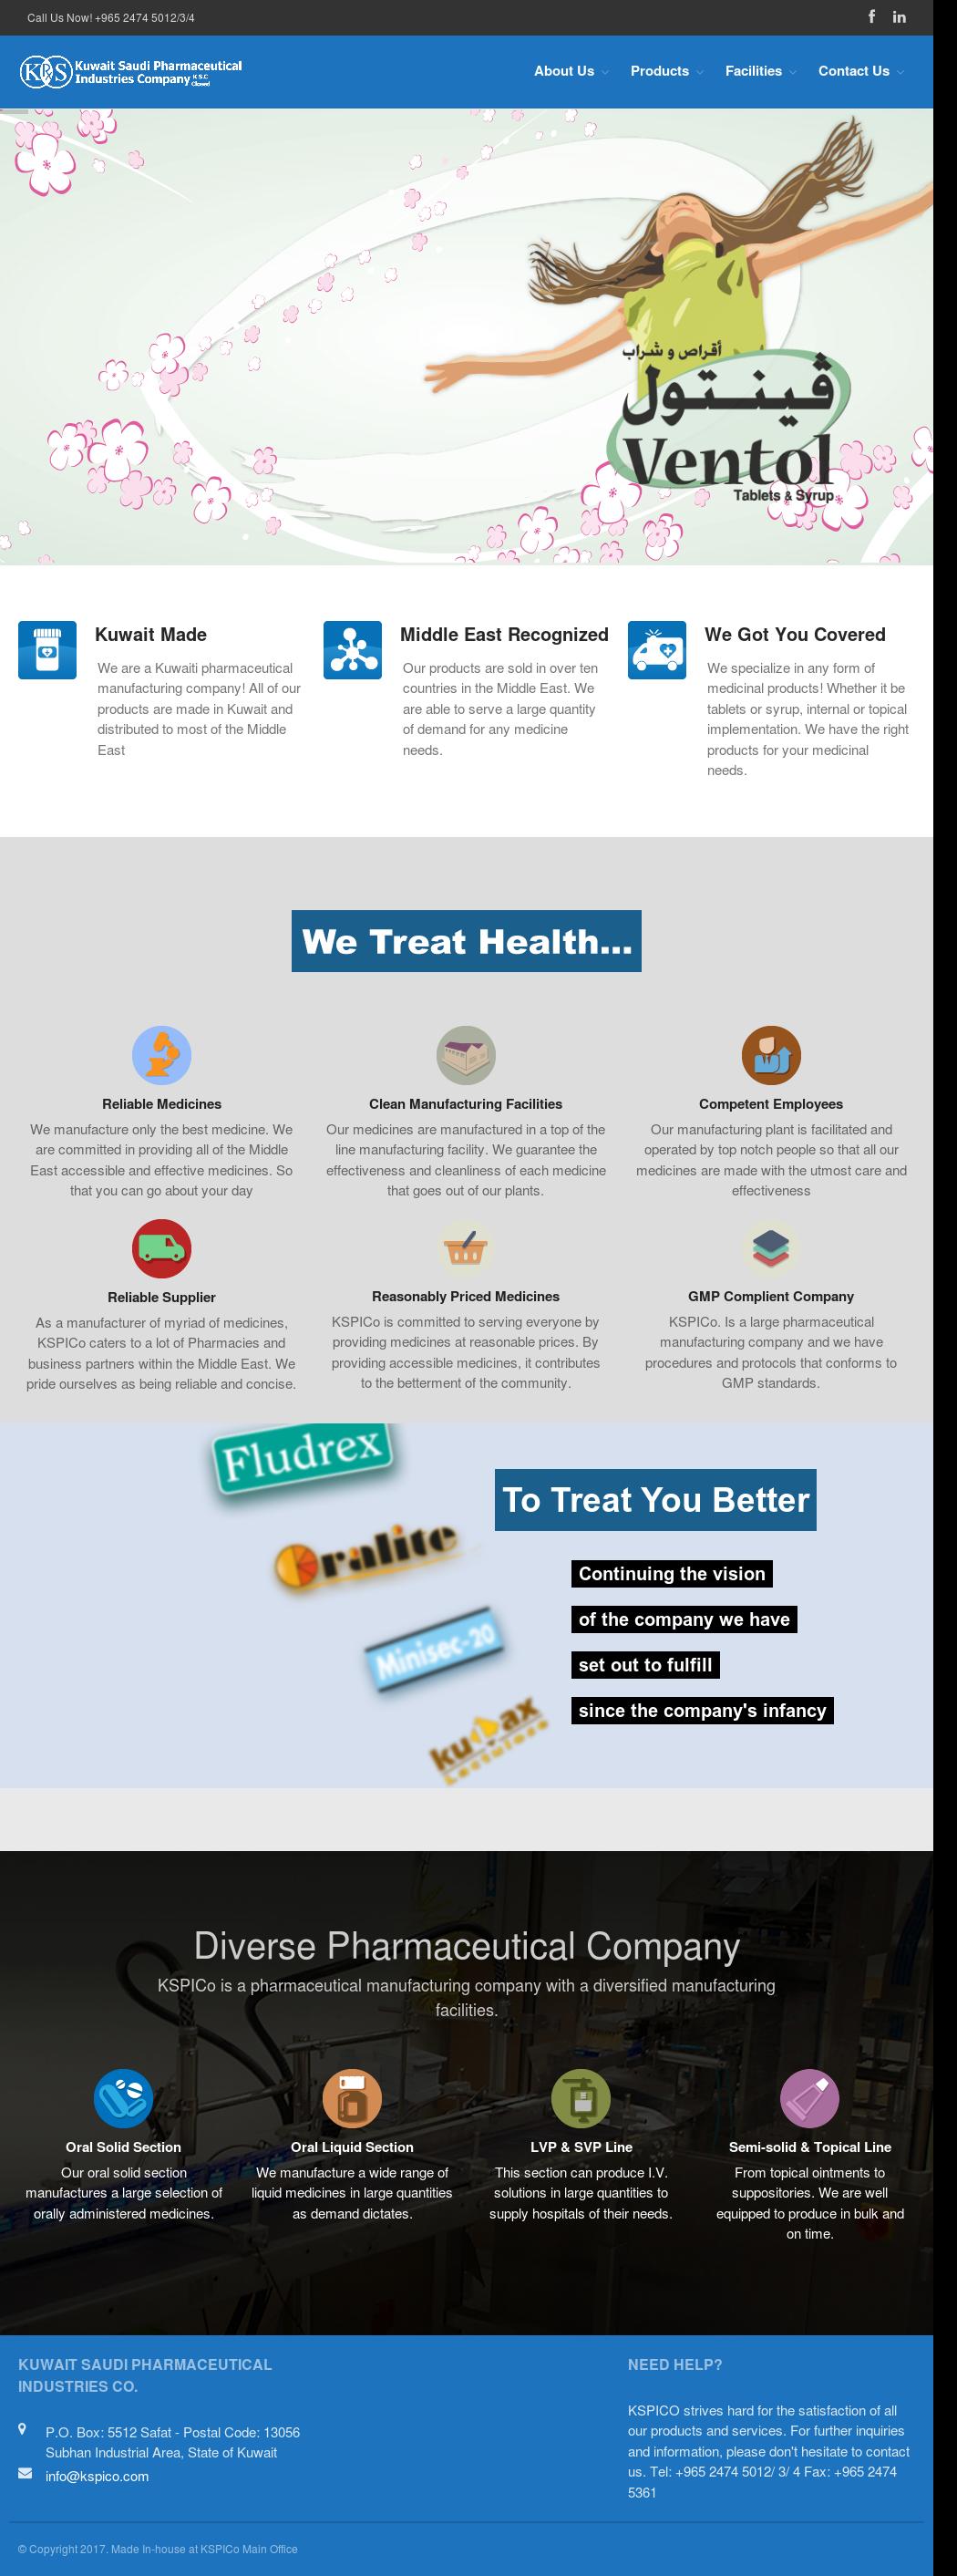 Kuwait Saudi Pharmaceuticals Industries Competitors, Revenue and